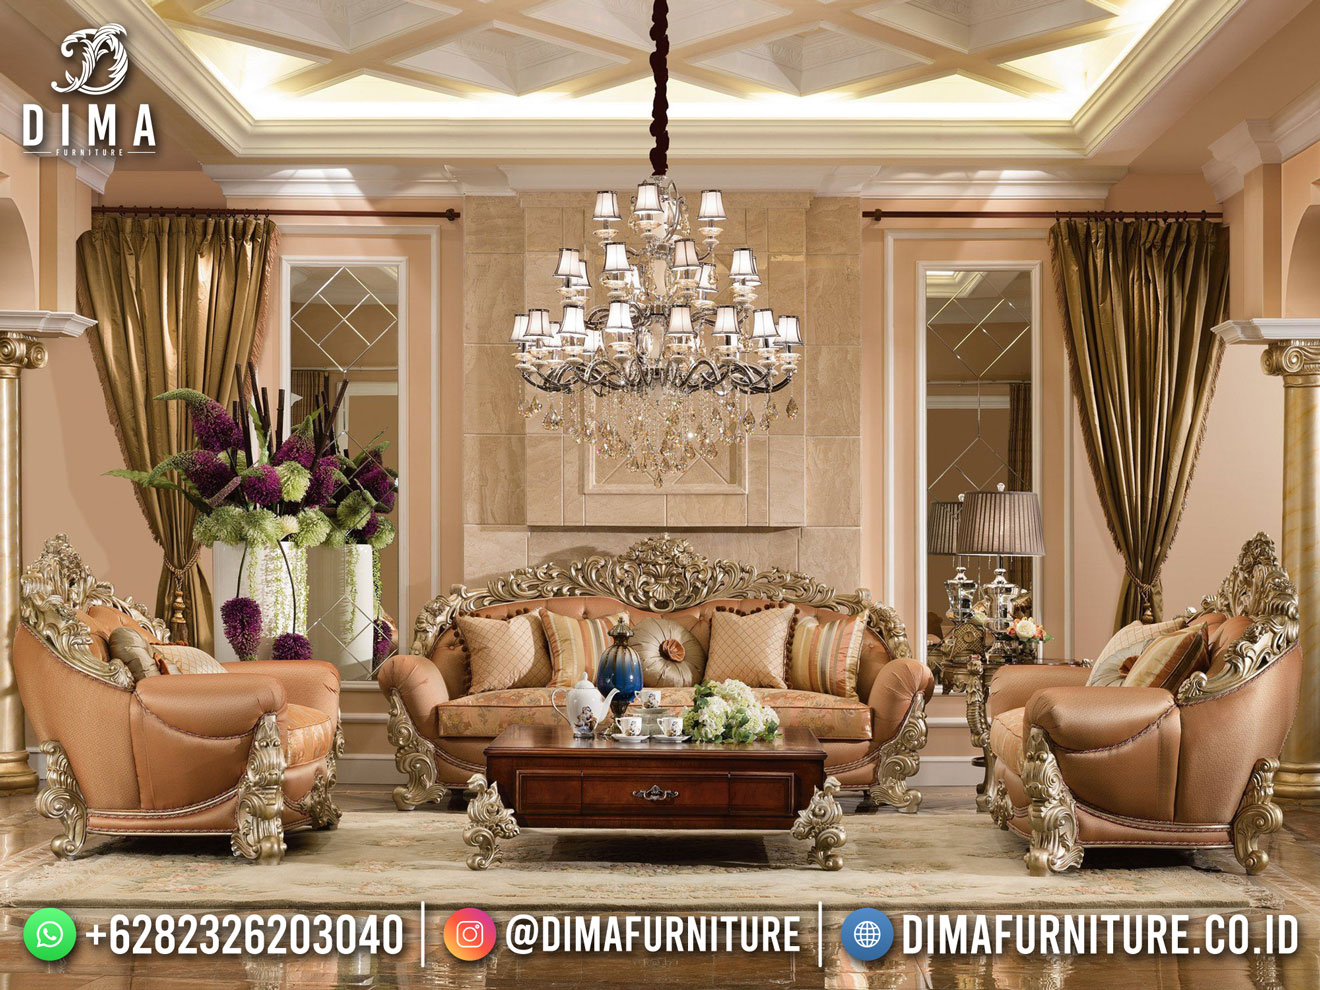 Sofa Tamu Mewah Ukir Luxury Design Furniture Jepara TTJ-1801